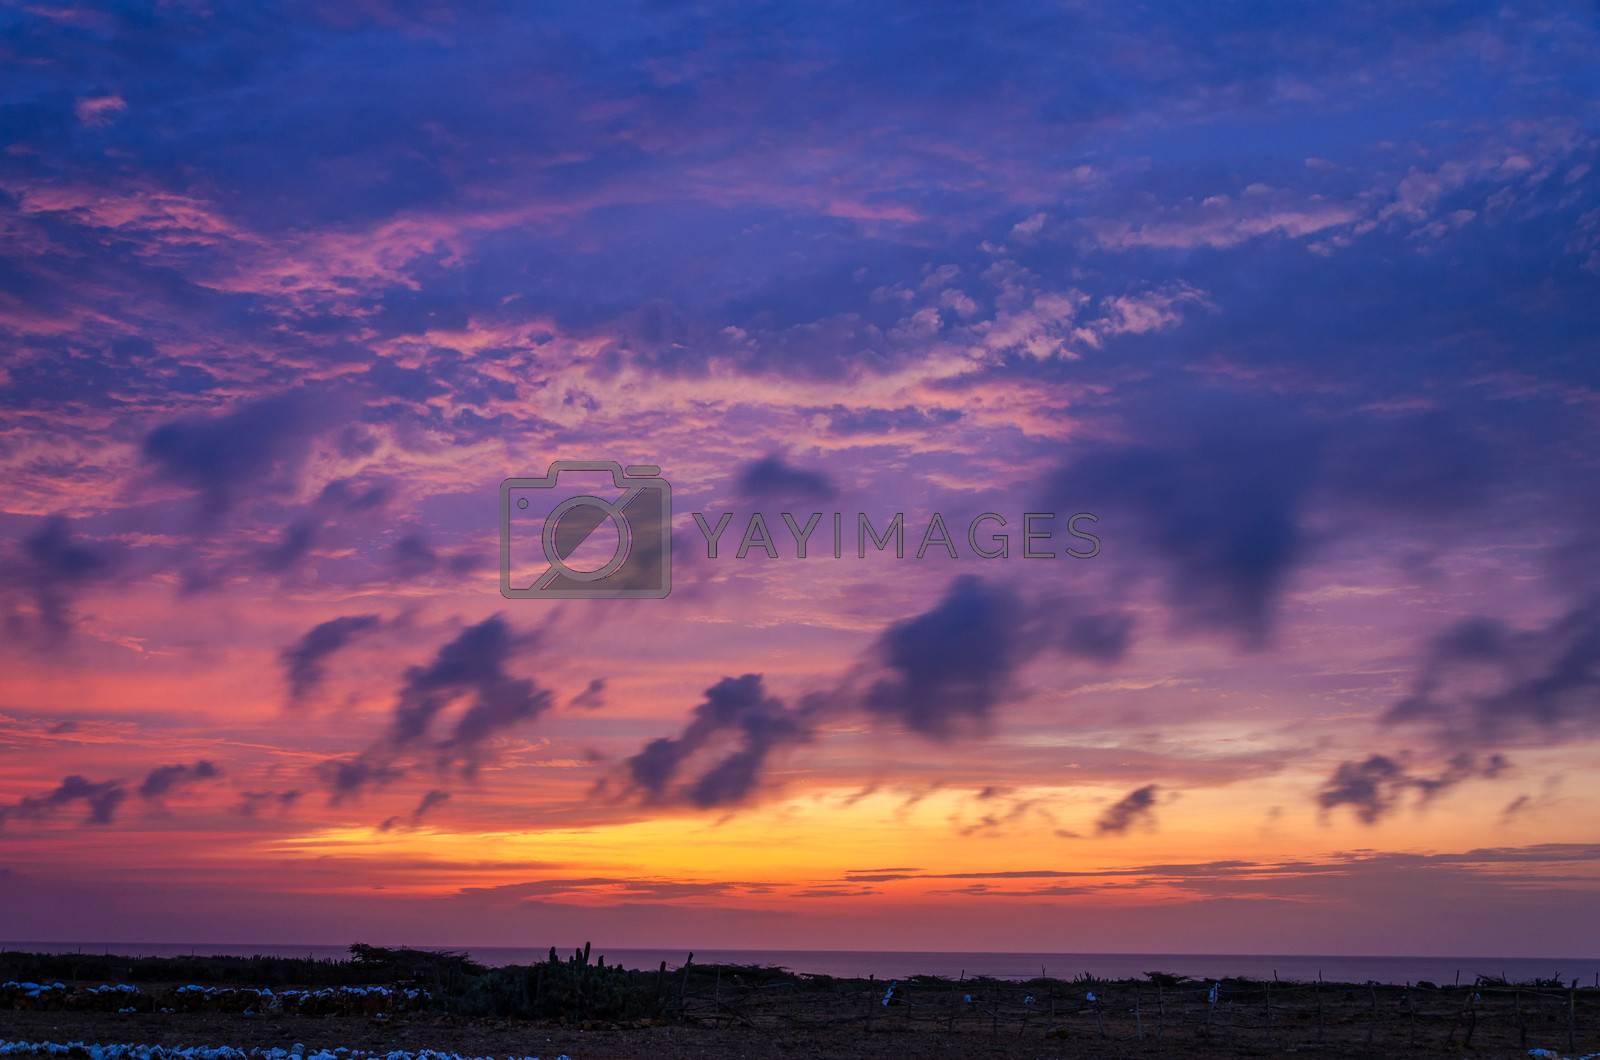 Purple, yellow, and orange sunset in La Guajira, Colombia